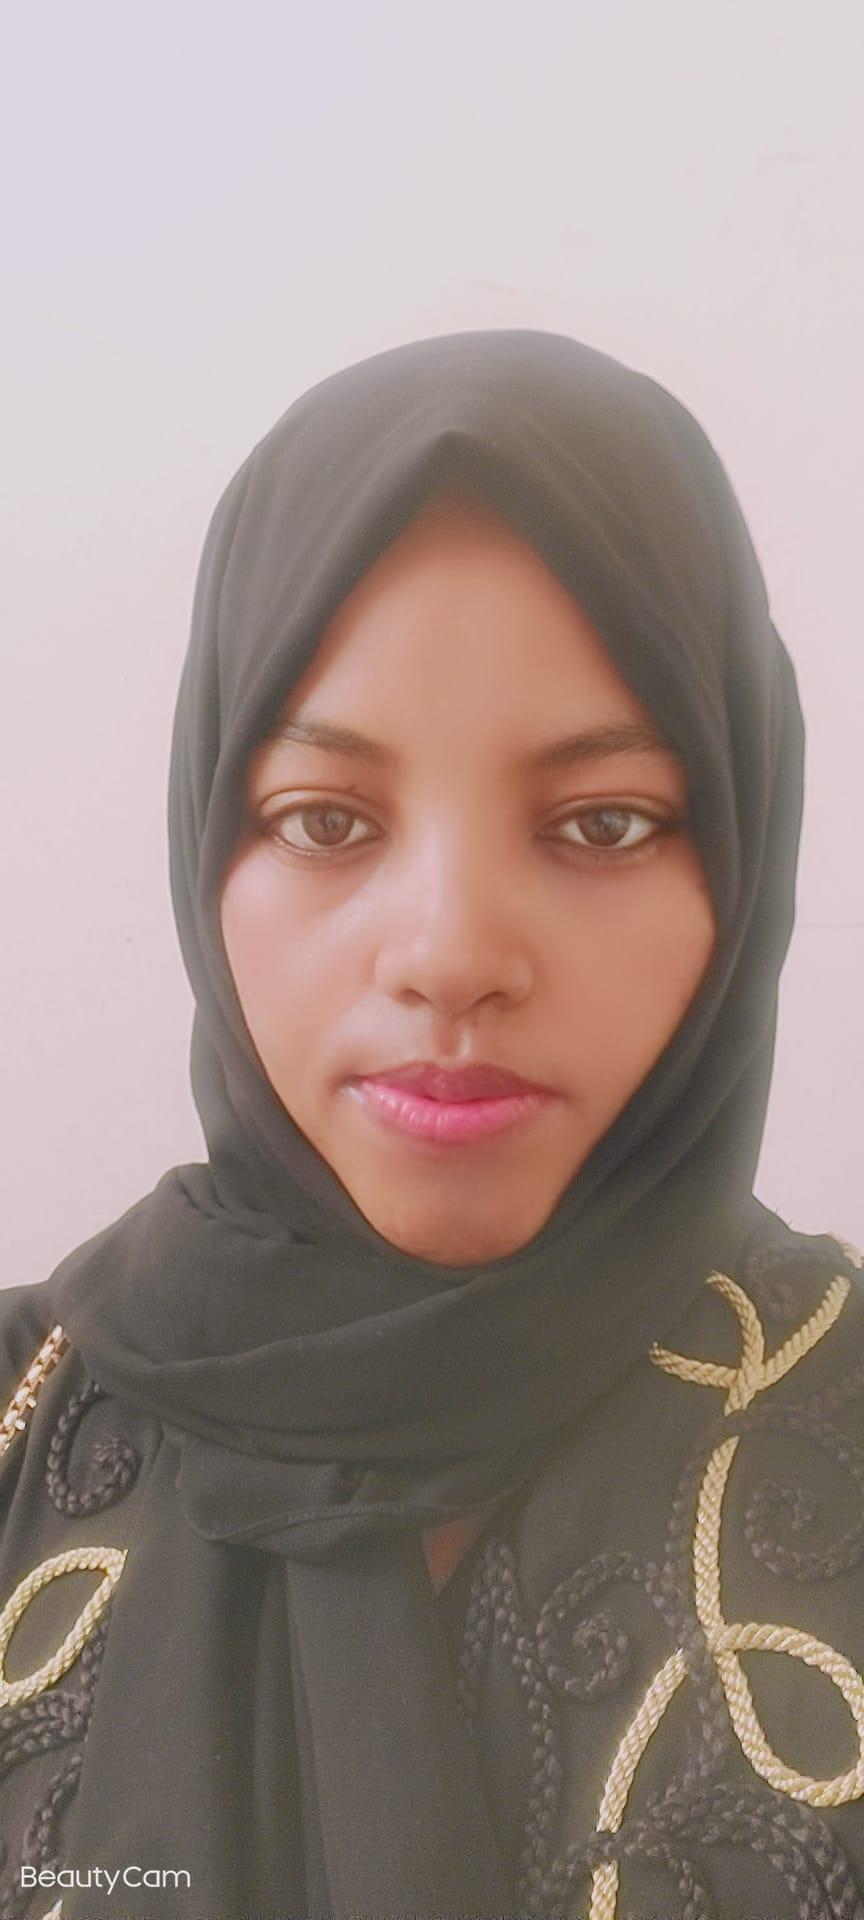 Samra Jamali Mustefa photo_IM_2021081105585484.jpg